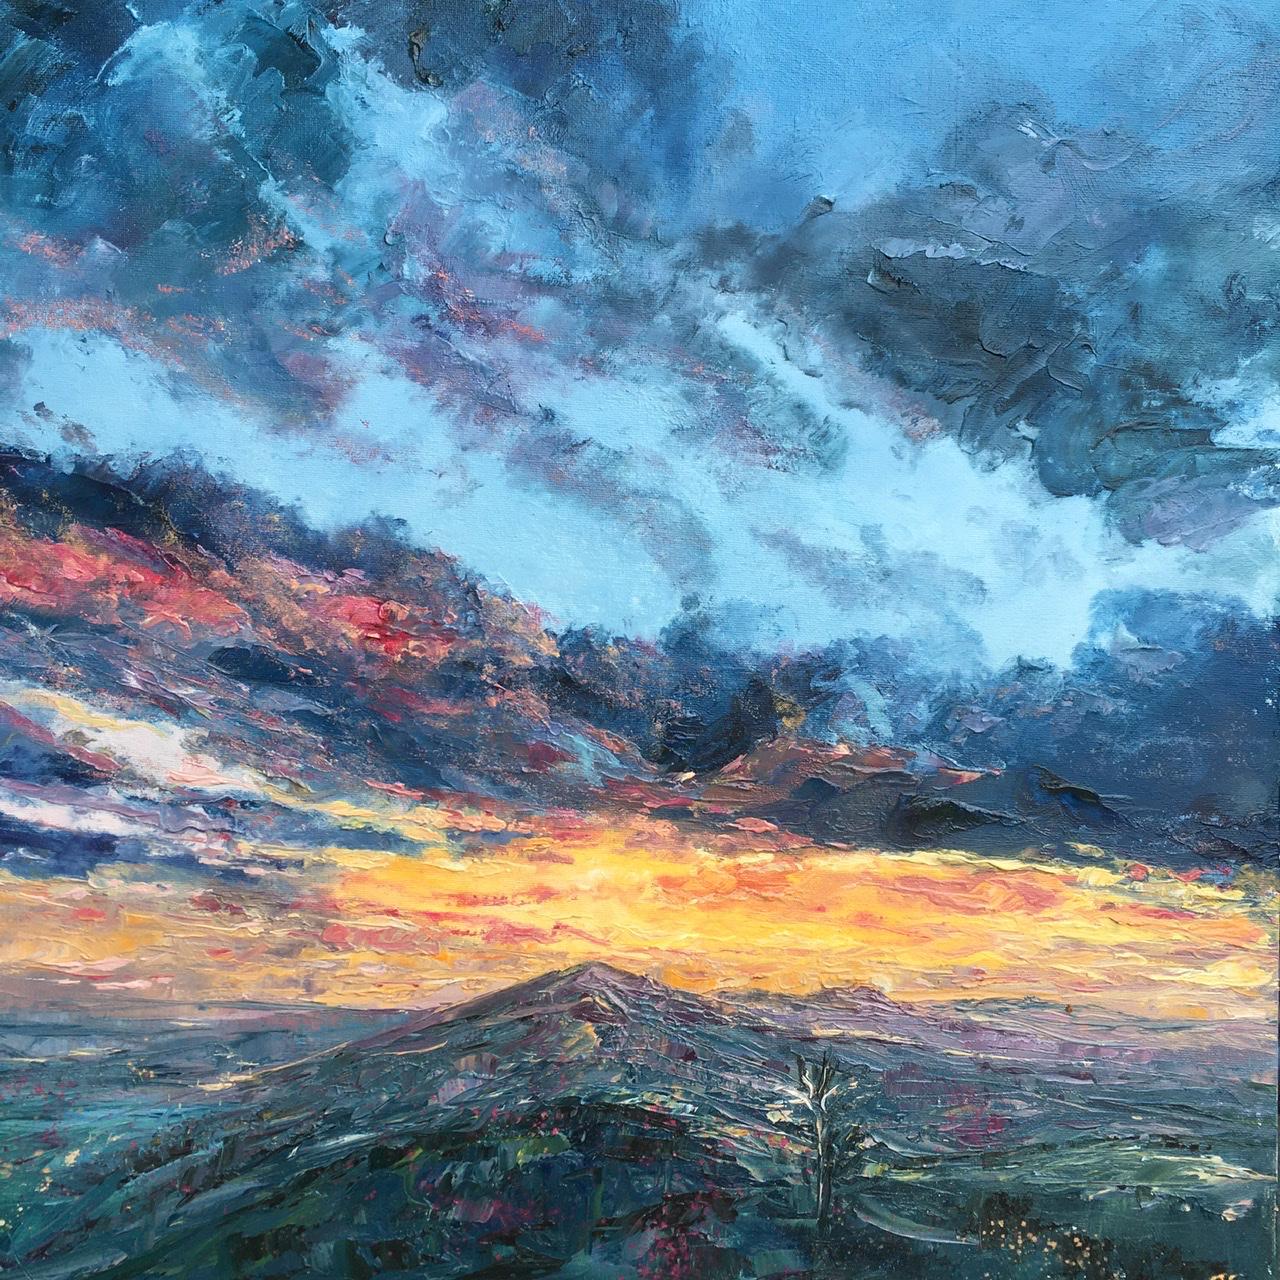 Malverns lockdown sunset, oil painting by Anna Cumming